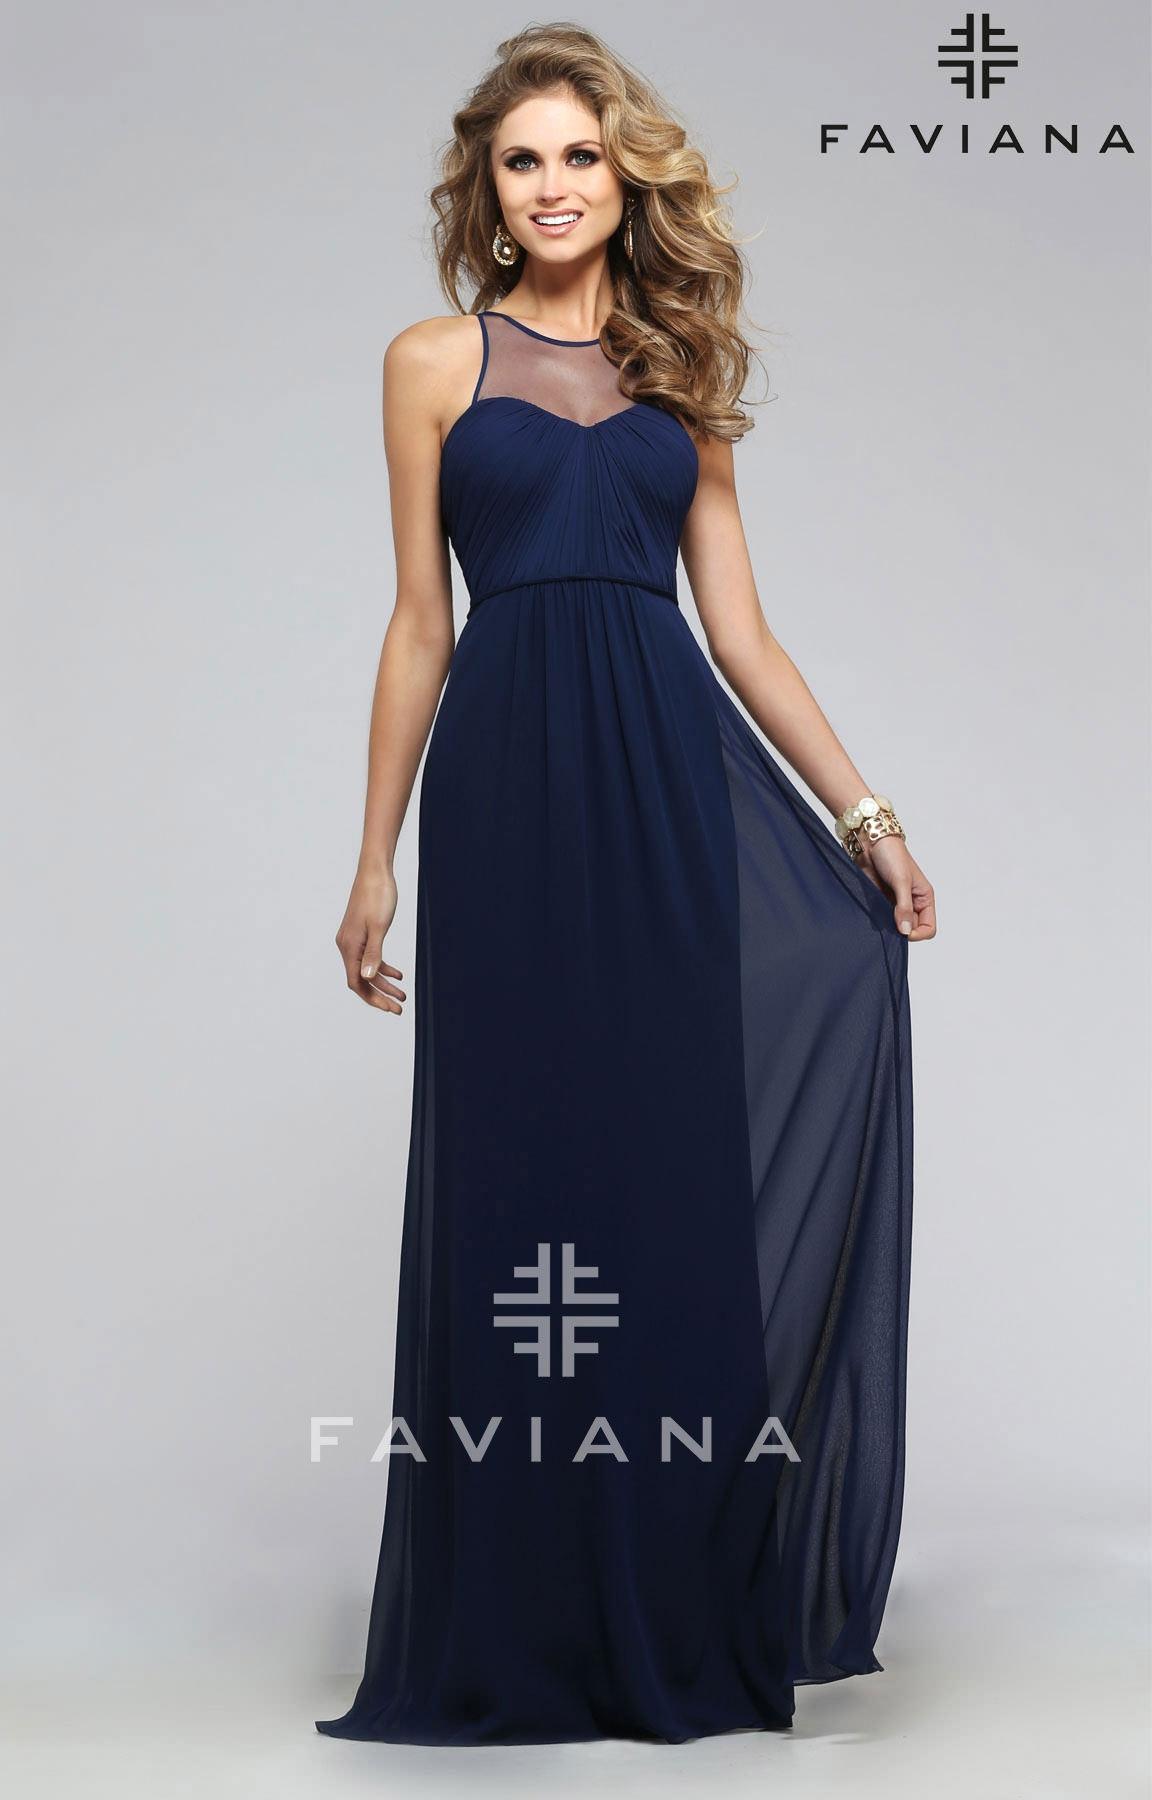 Orange Chiffon Its Fashion Metro Blouses Dark Brown: Simple Sweetie Dress Prom Dress